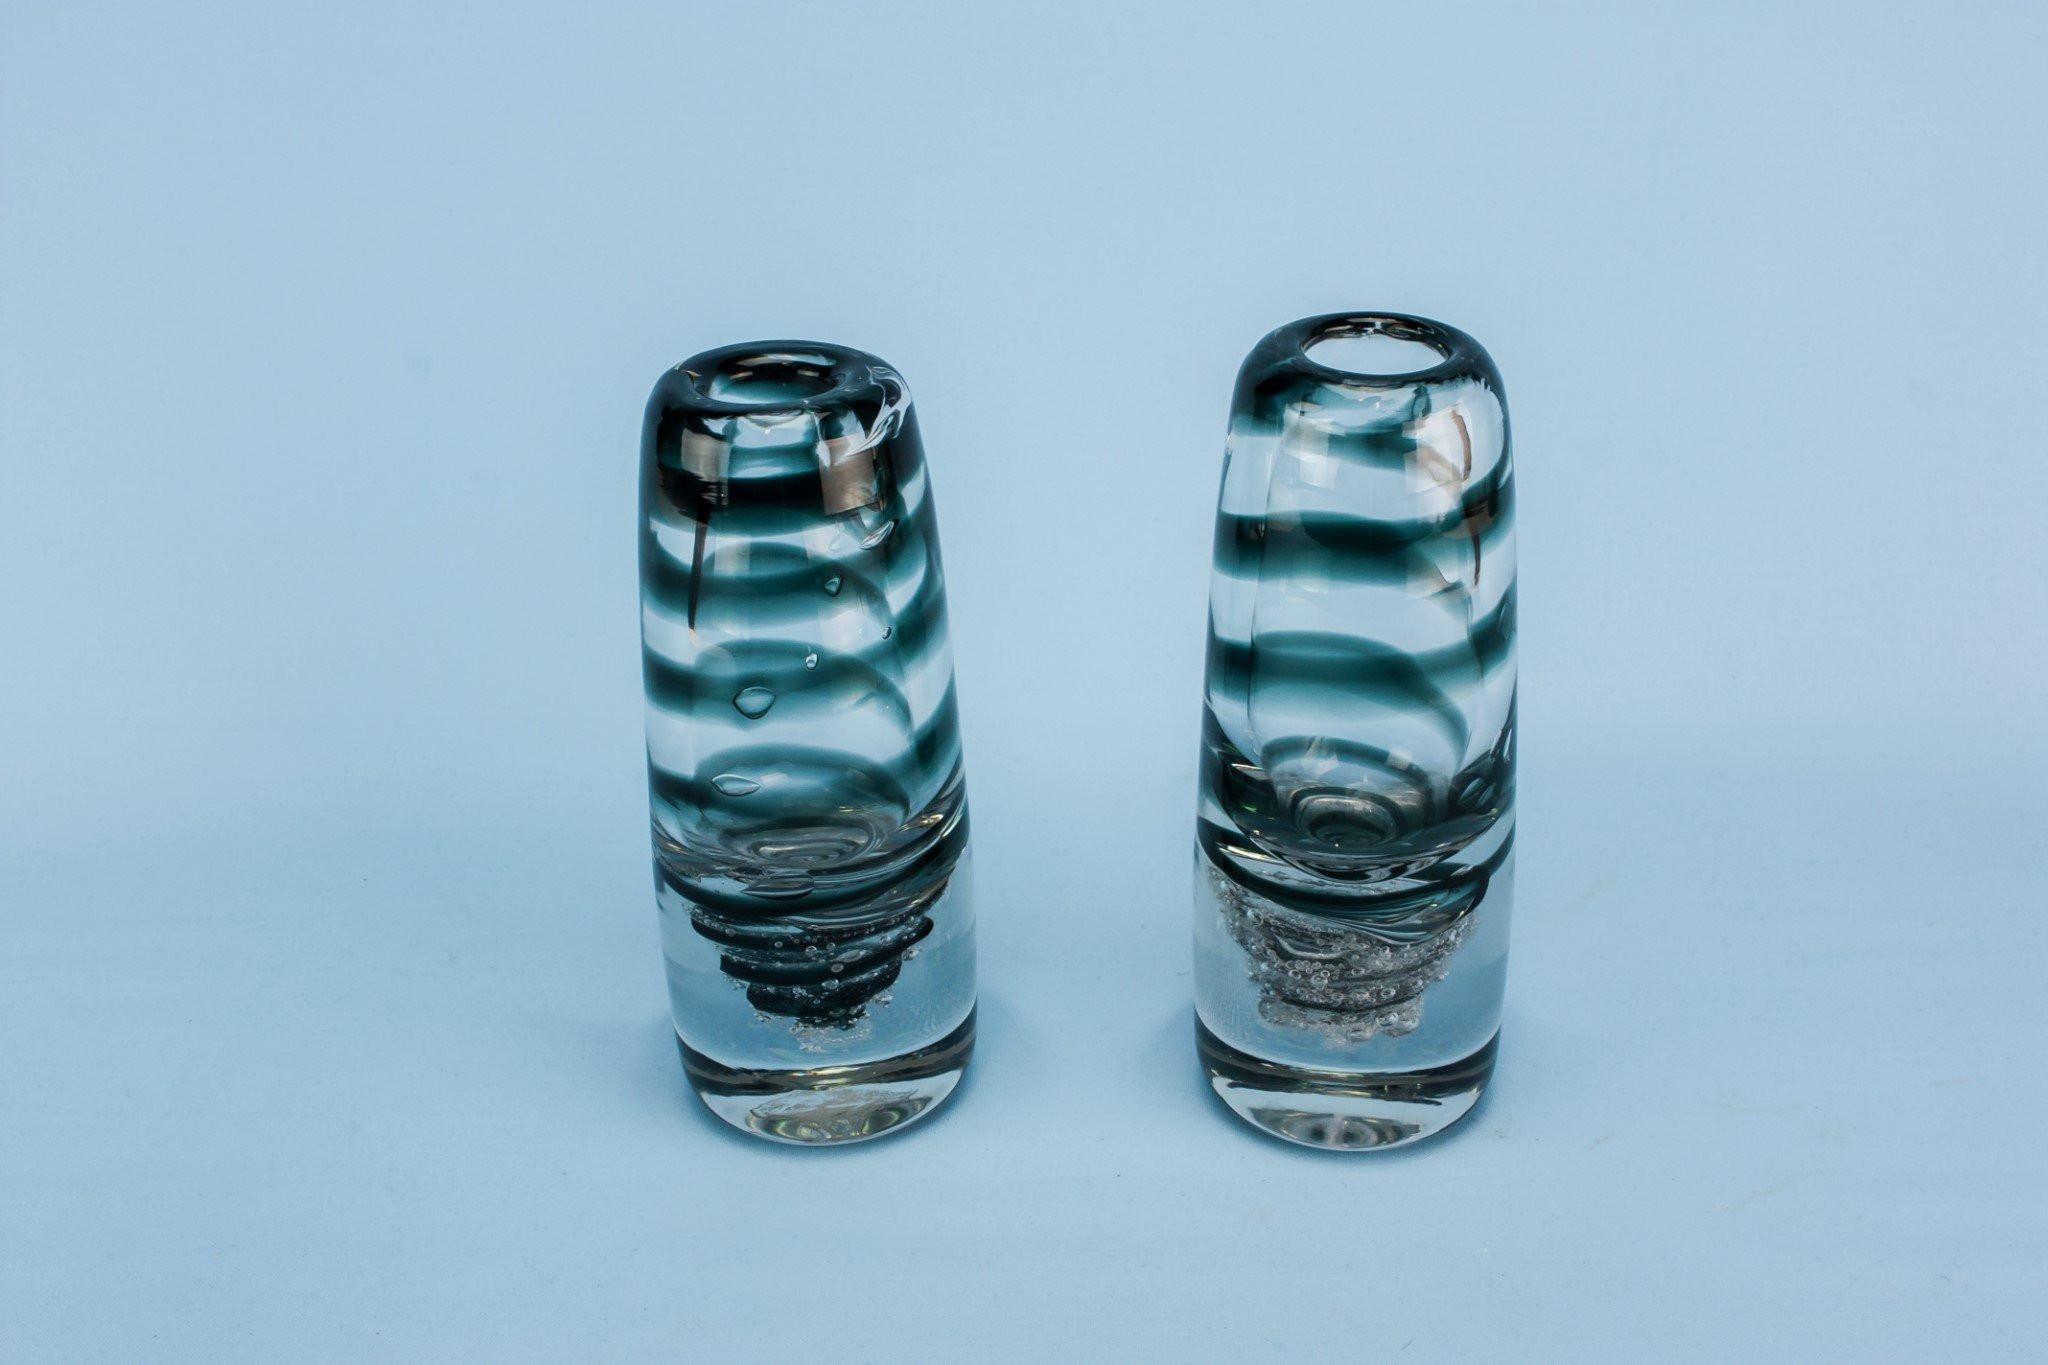 15 attractive Blue Glass Vases Cheap 2021 free download blue glass vases cheap of 17 fresh antique blue glass vases bogekompresorturkiye com with 2 glass vases